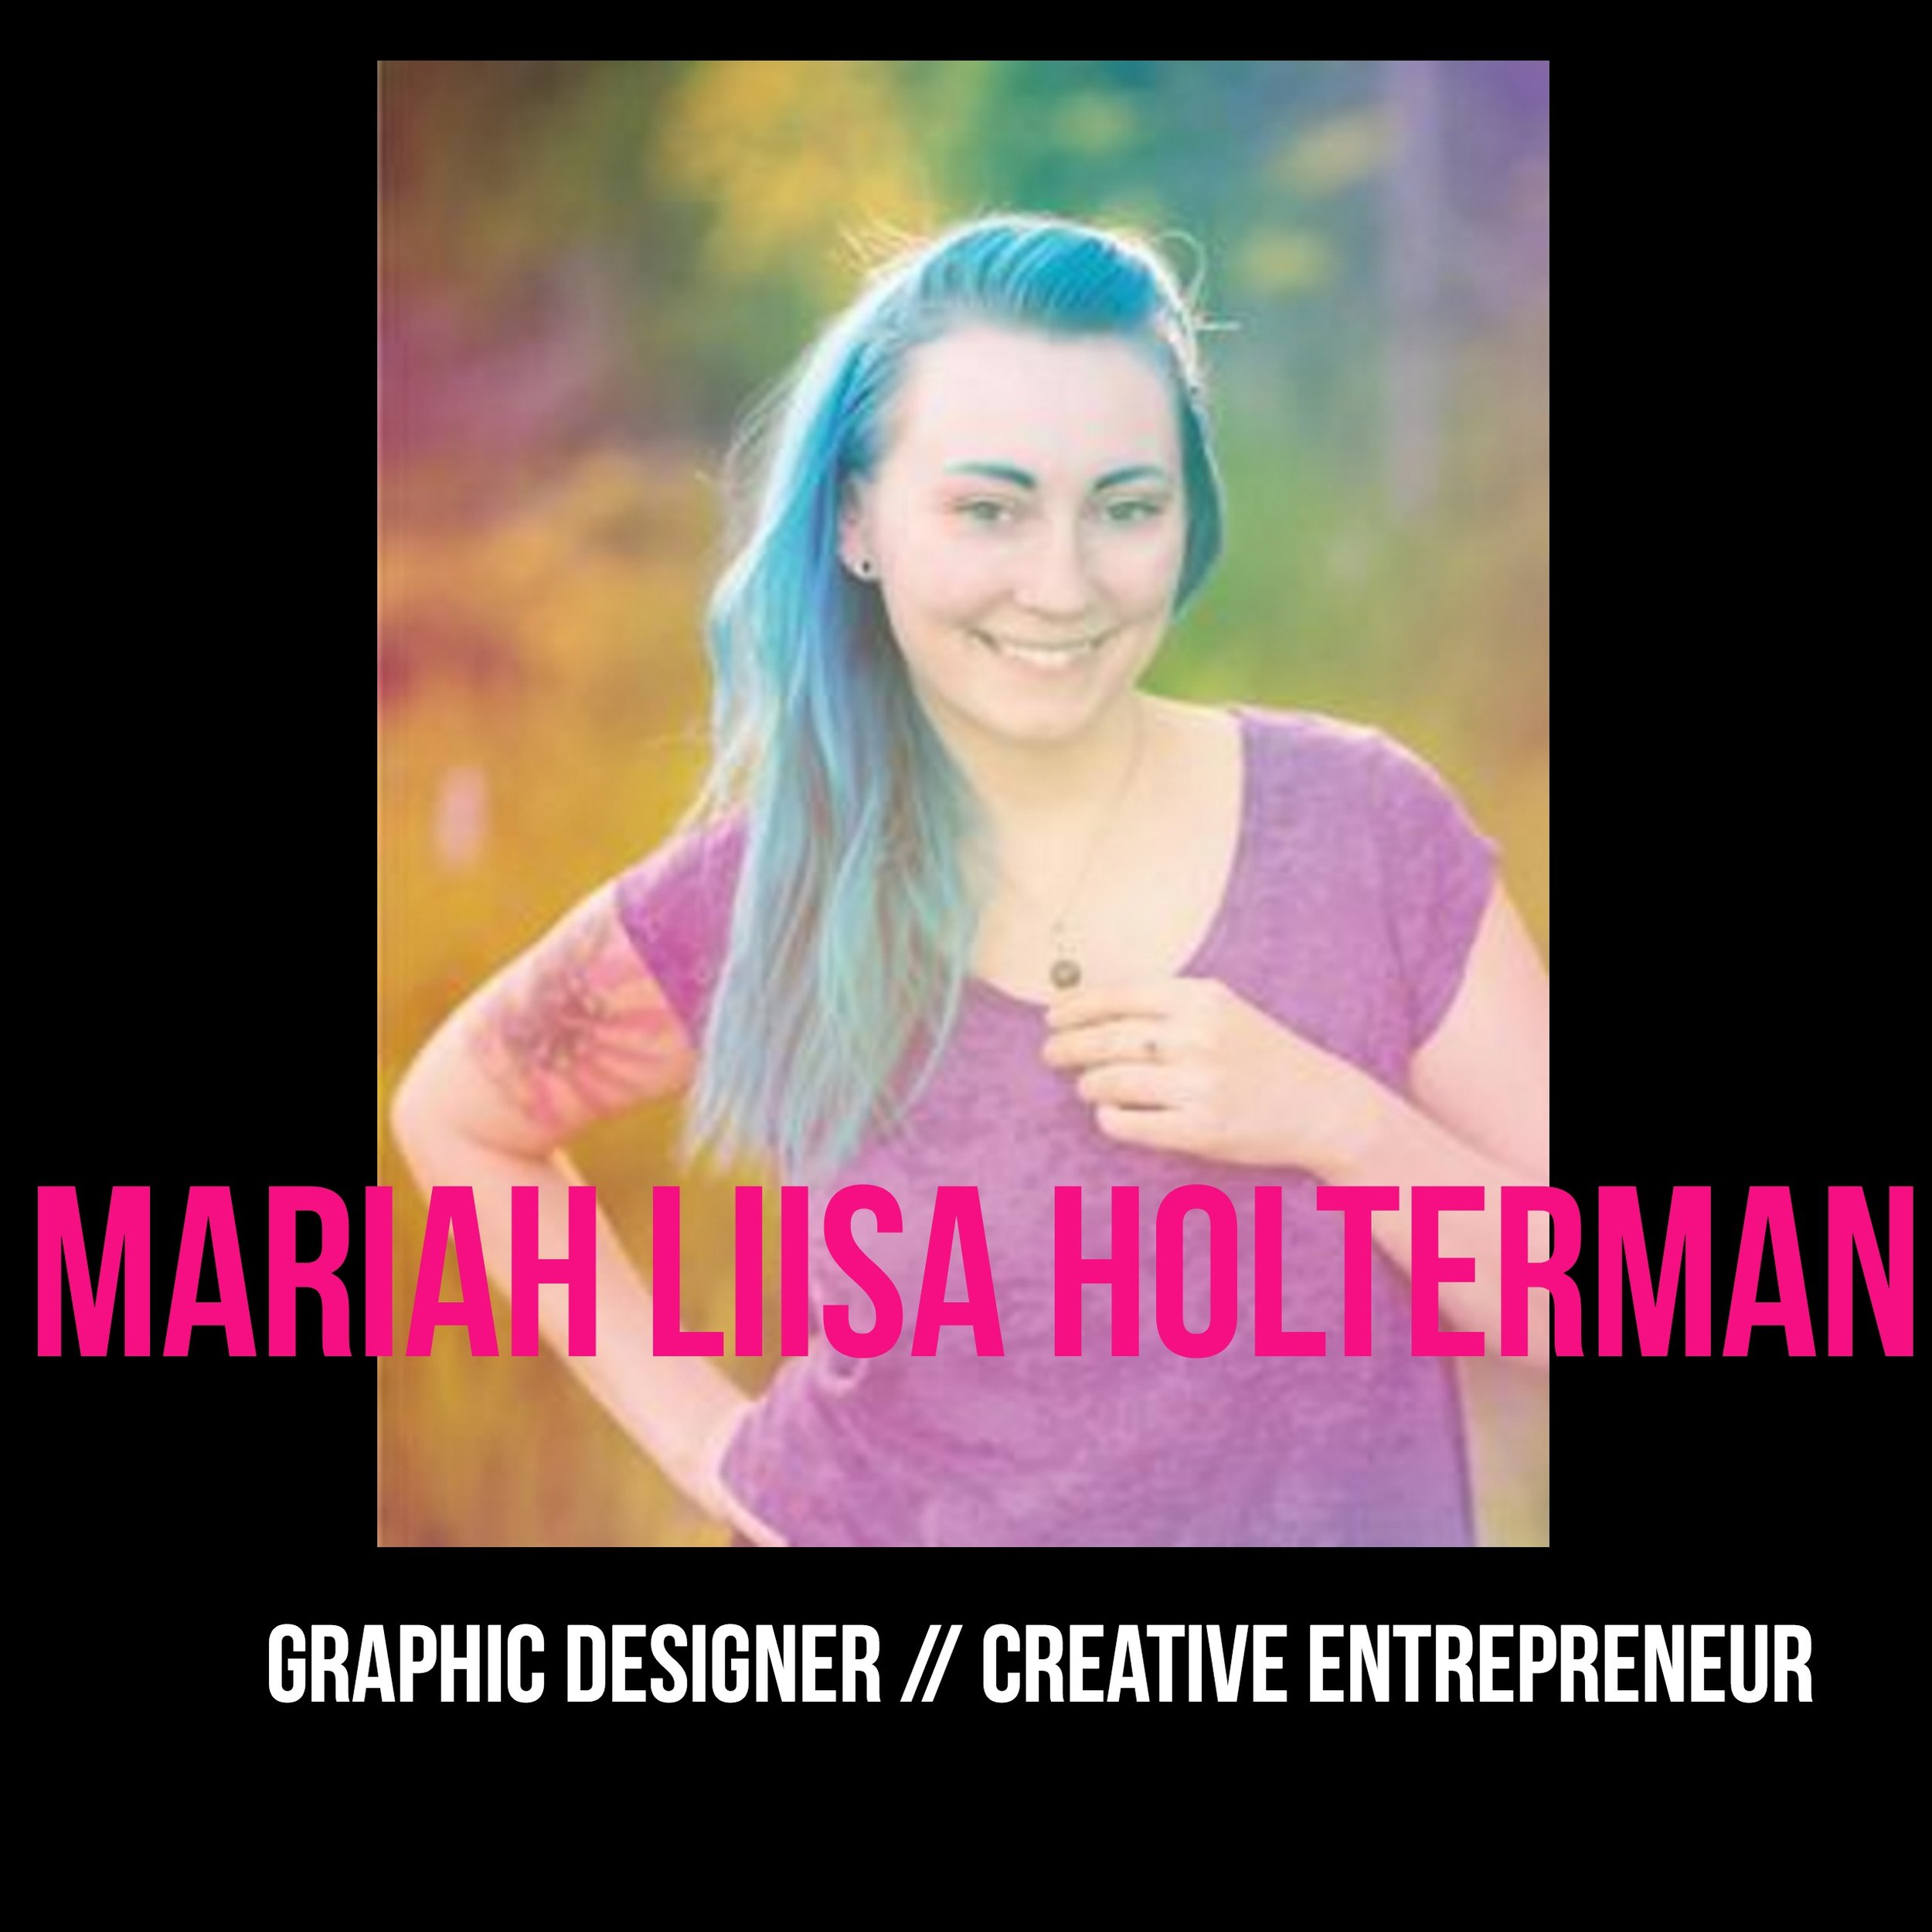 THE JILLS OF ALL TRADES™ Mariah Liisa Holterman Graphic Designer